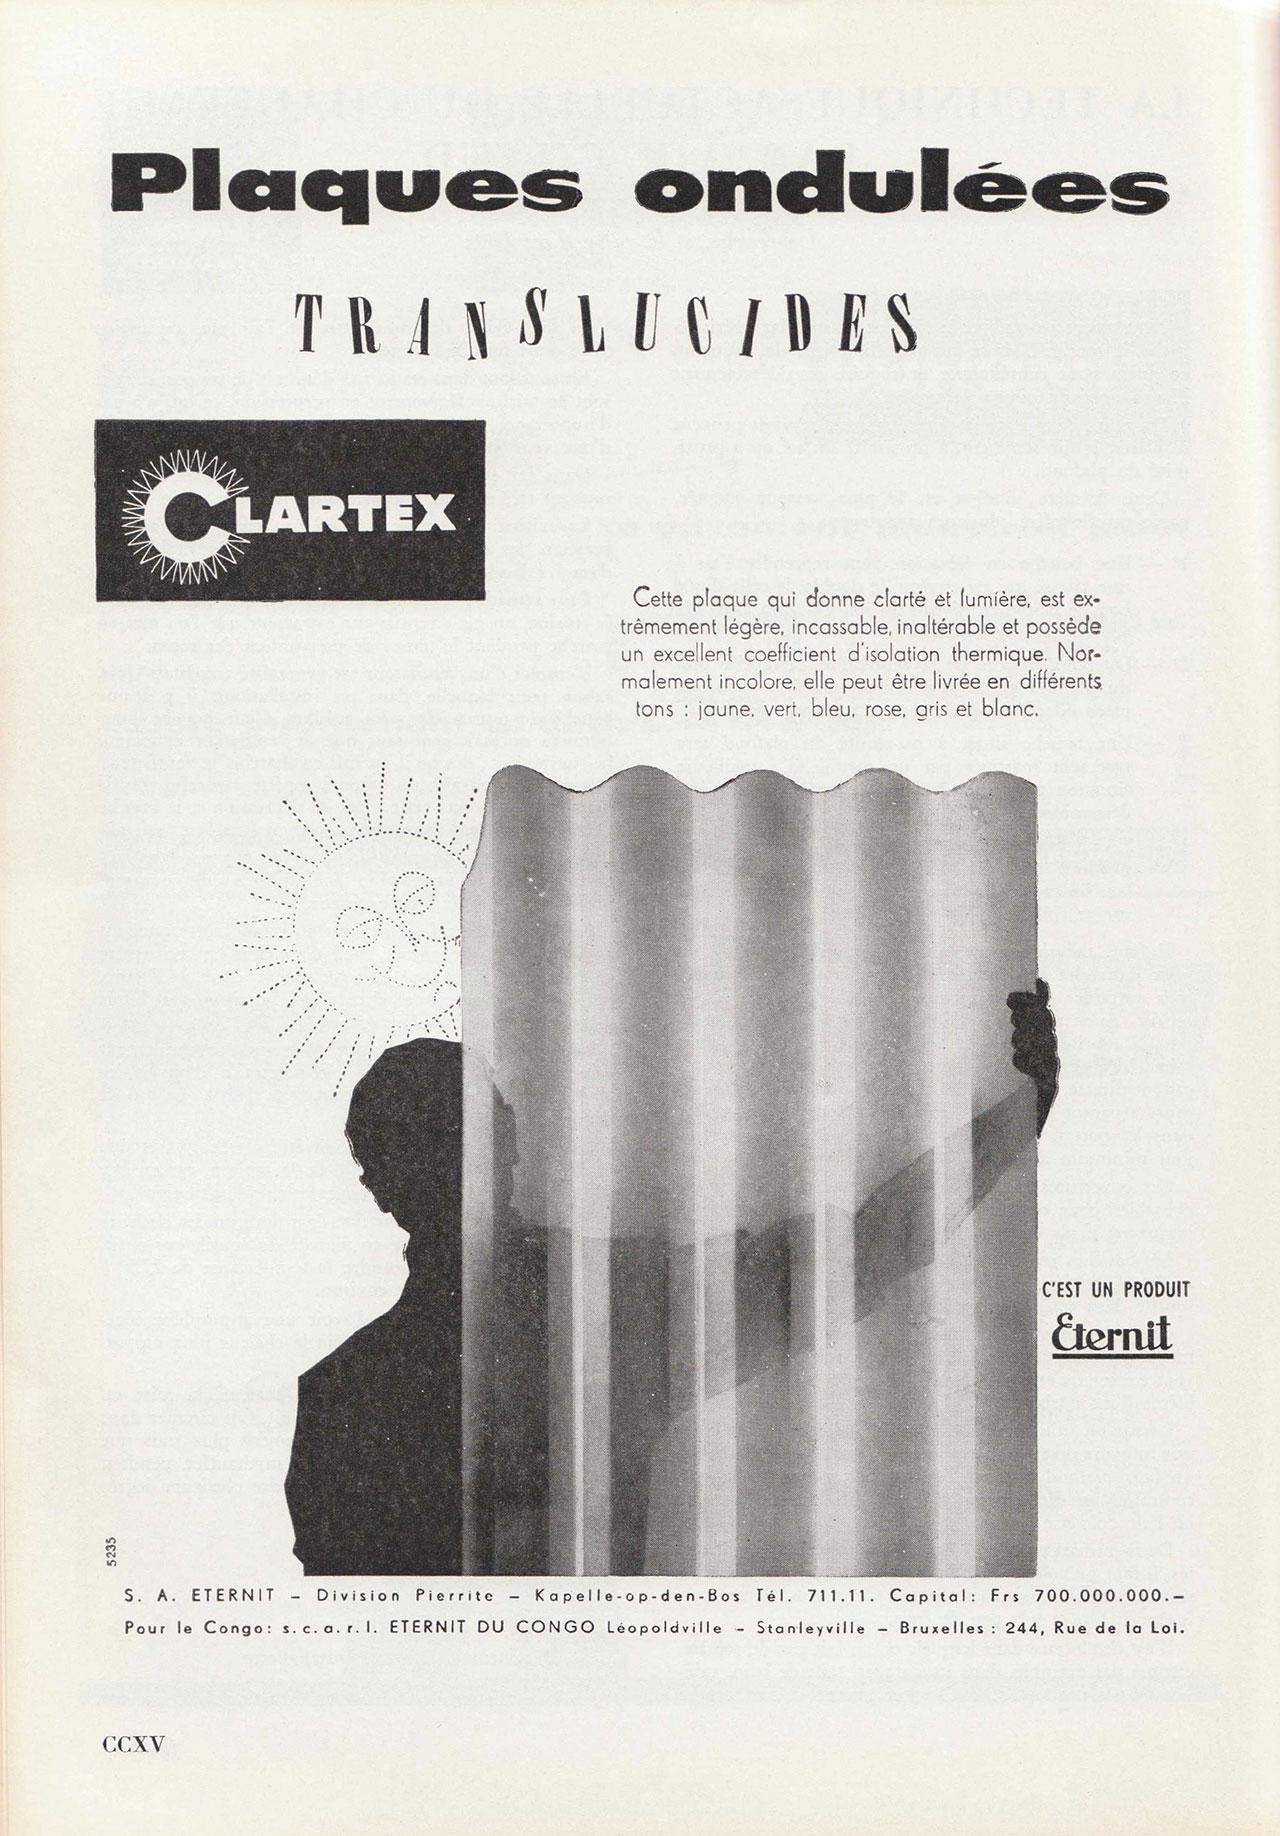 Plaques Ondulées Clartex